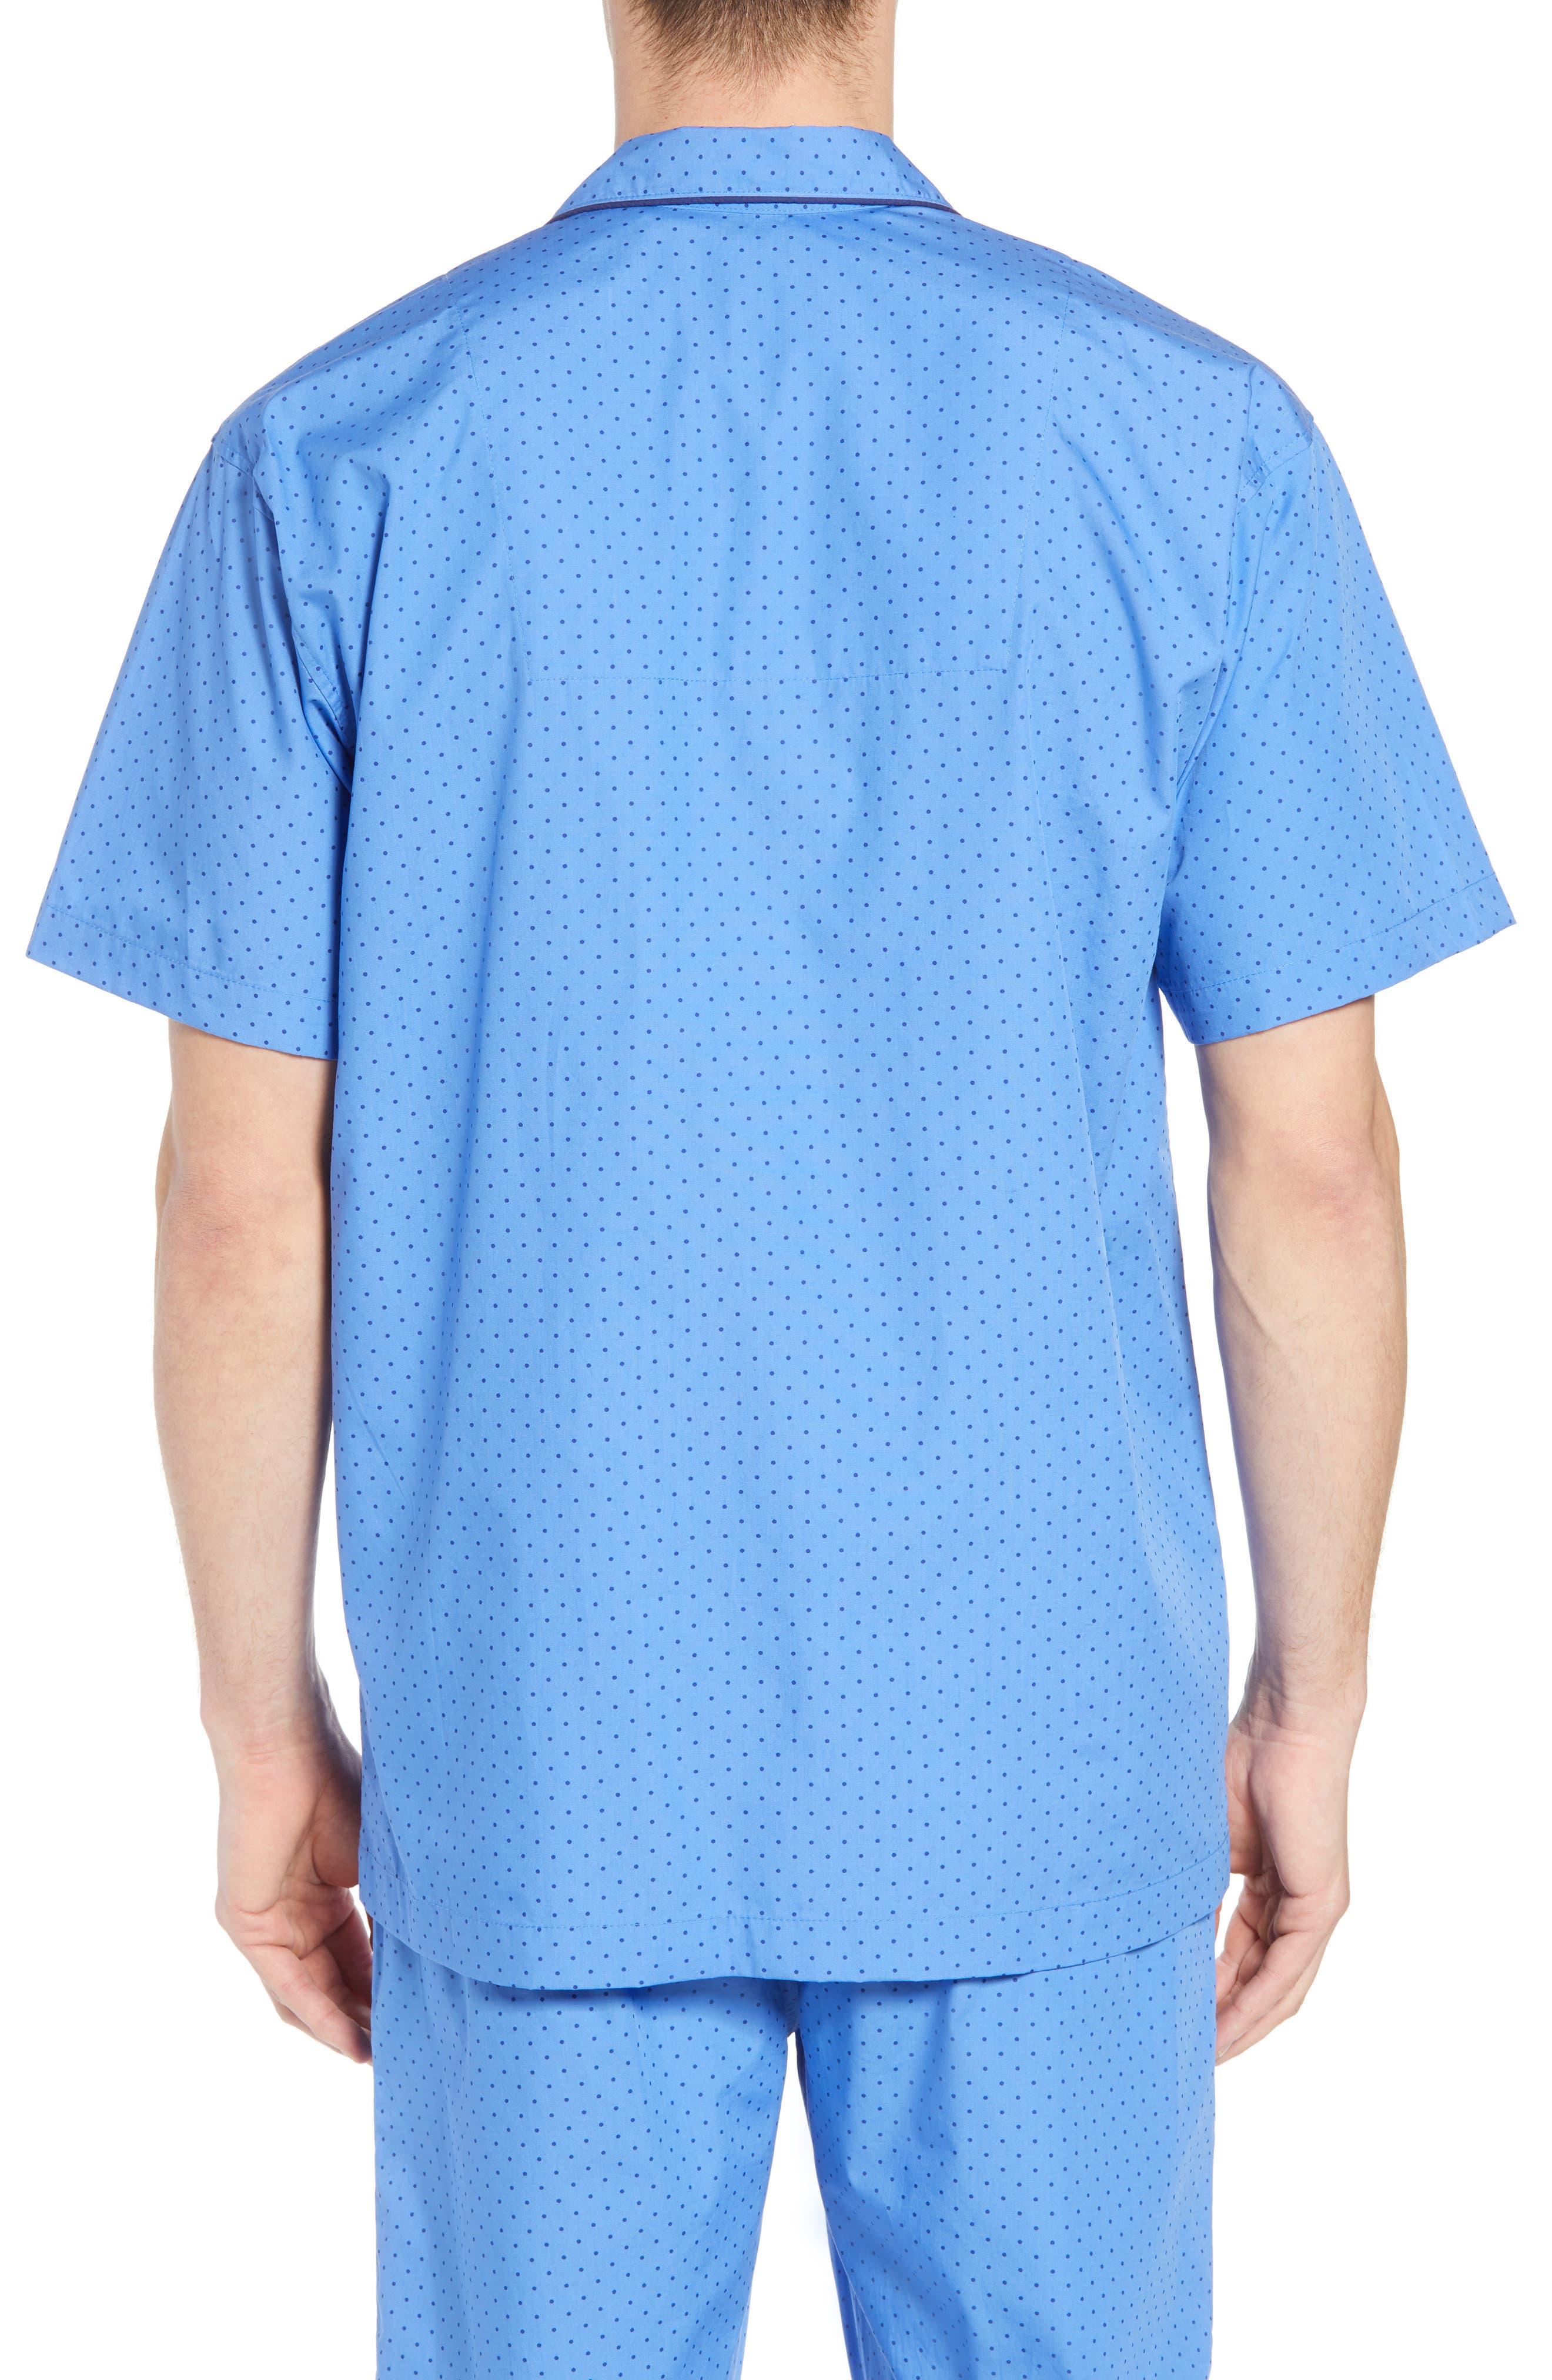 Dot Cotton Pajama Shirt,                             Alternate thumbnail 2, color,                             Harbour Island Blue/ Navy